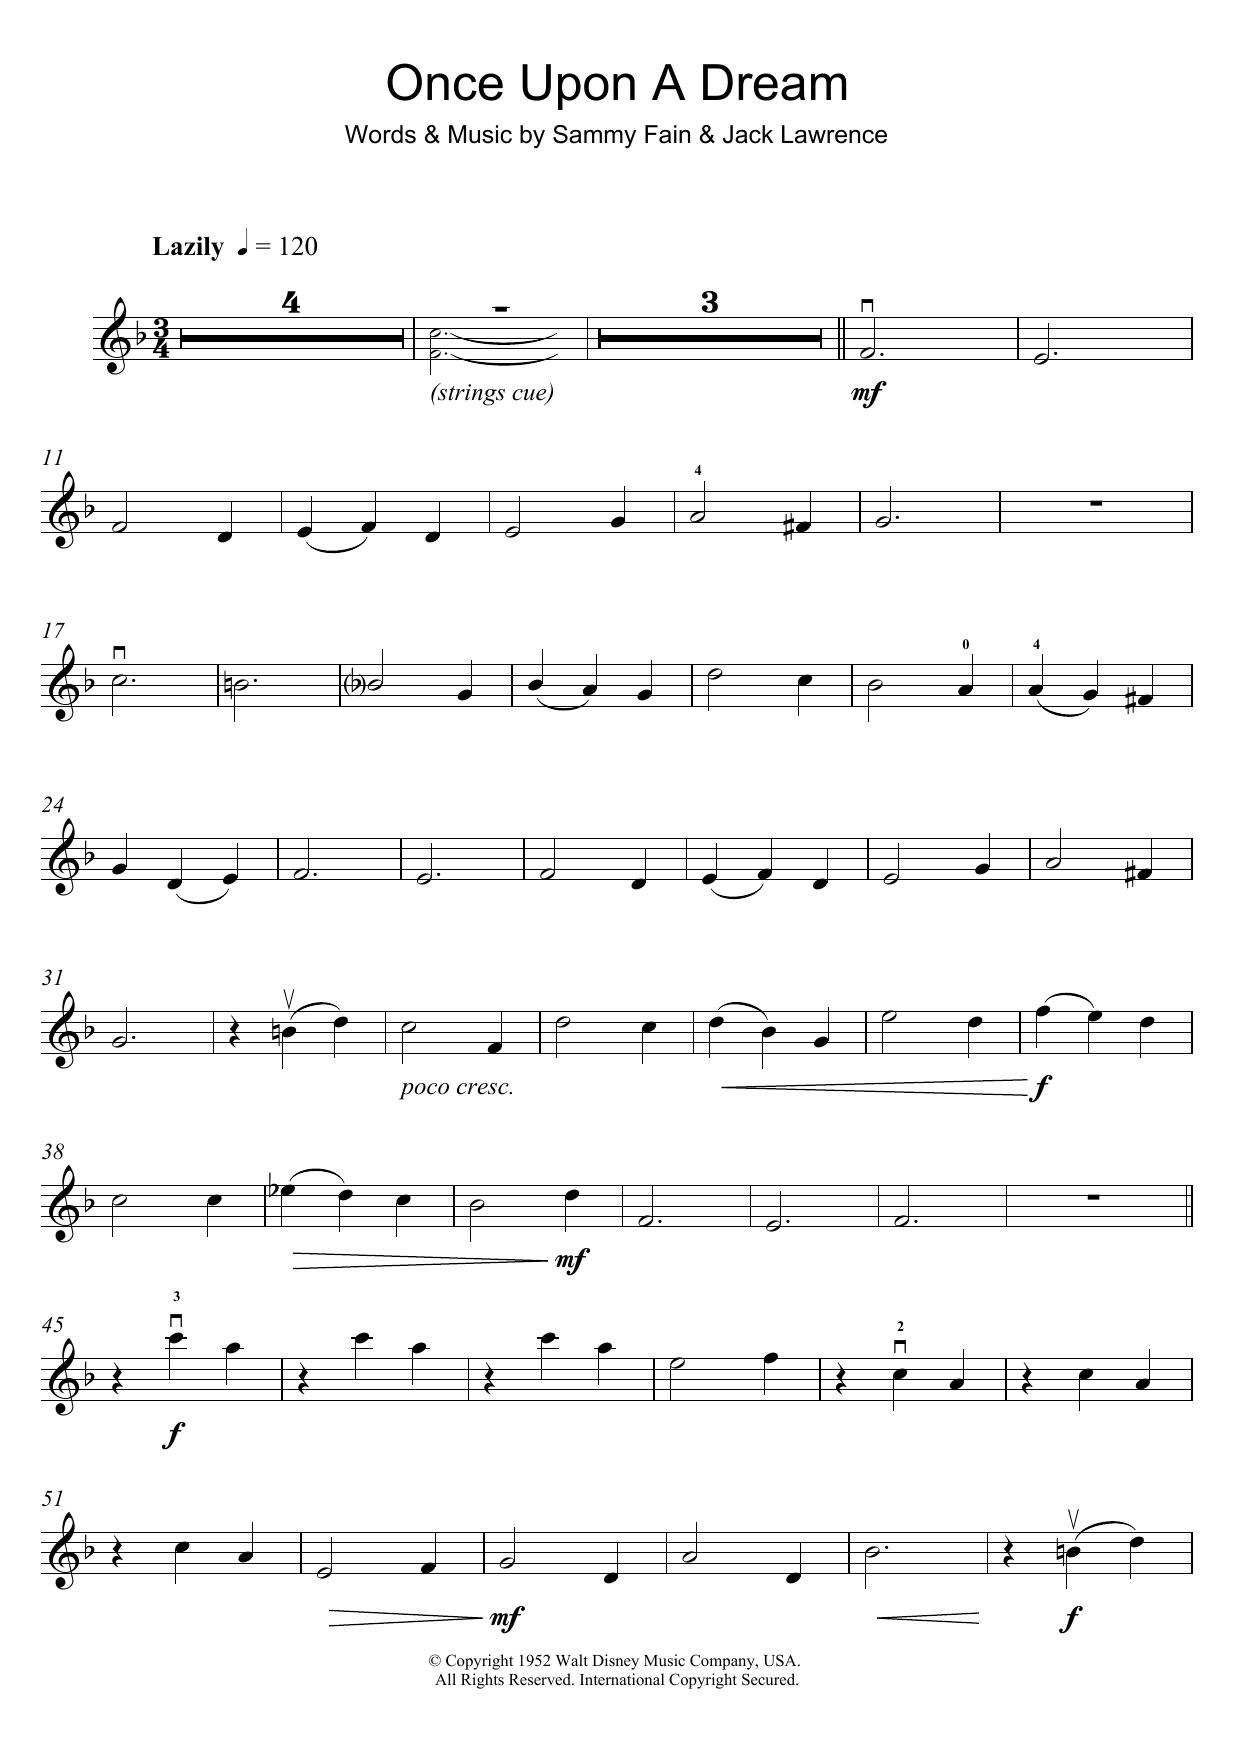 Hotel california violin sheet music pdf